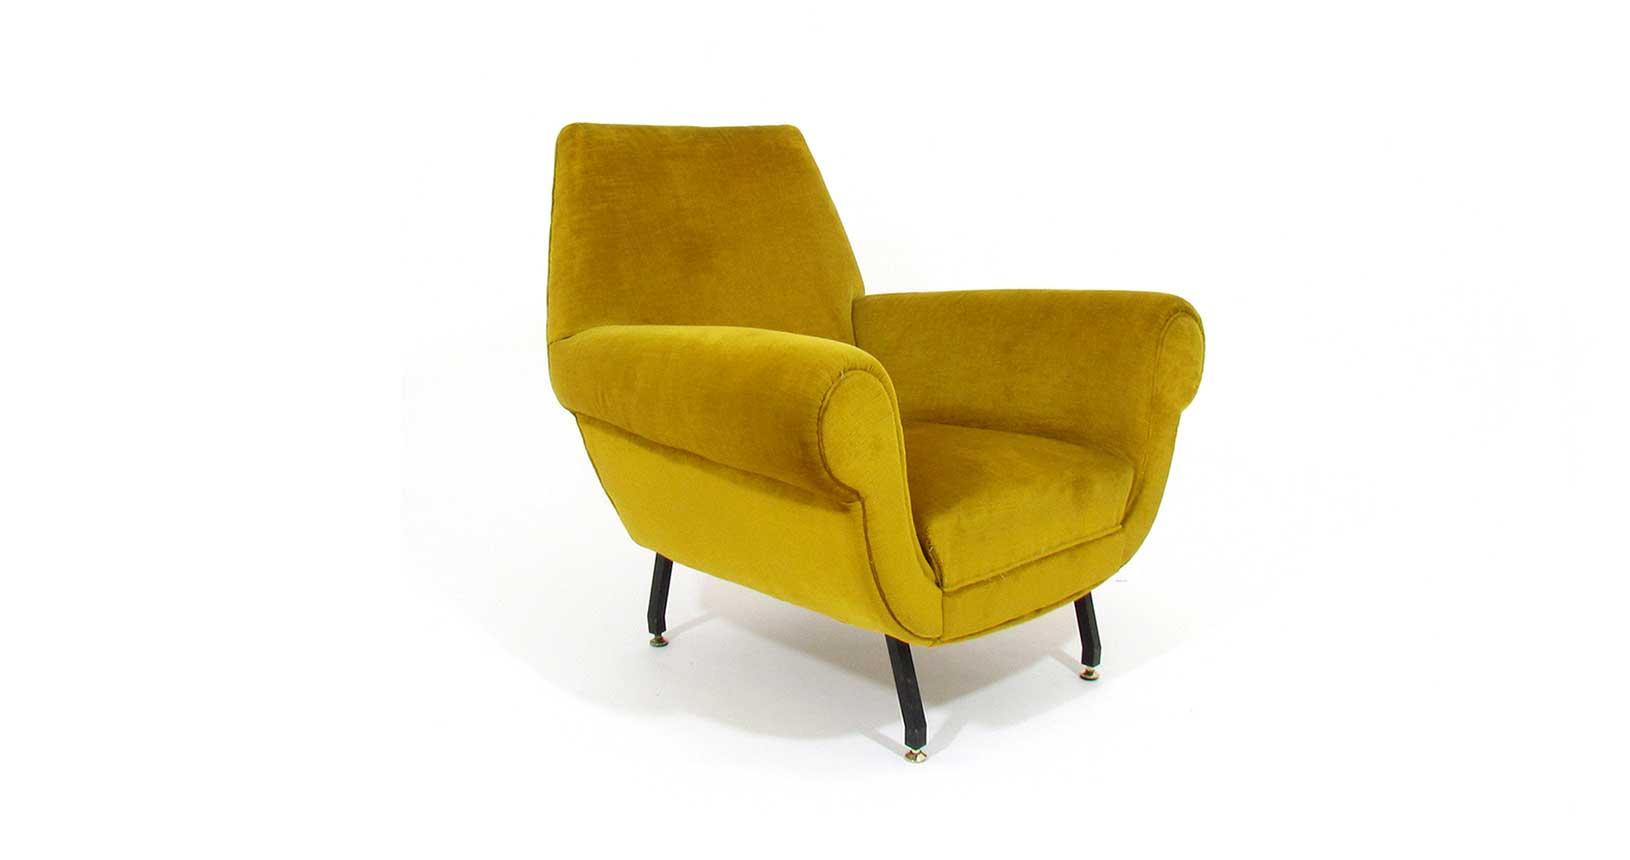 gigi radice armchair poltrona Minotti iron legs vintage iconic design furniture